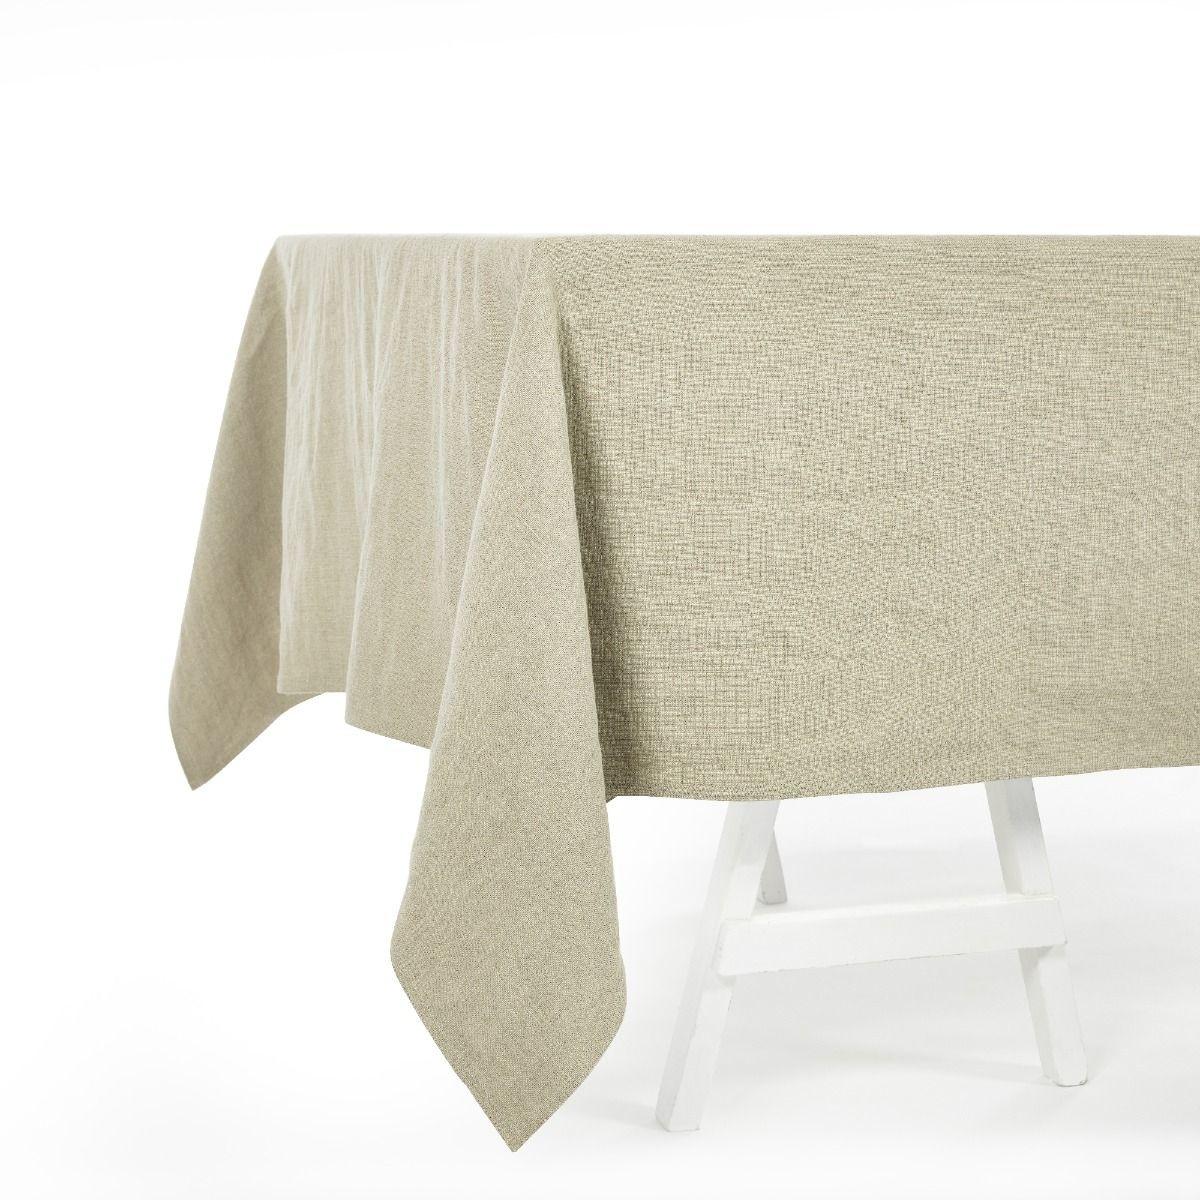 Tablecloth - Hudson - Flax-1